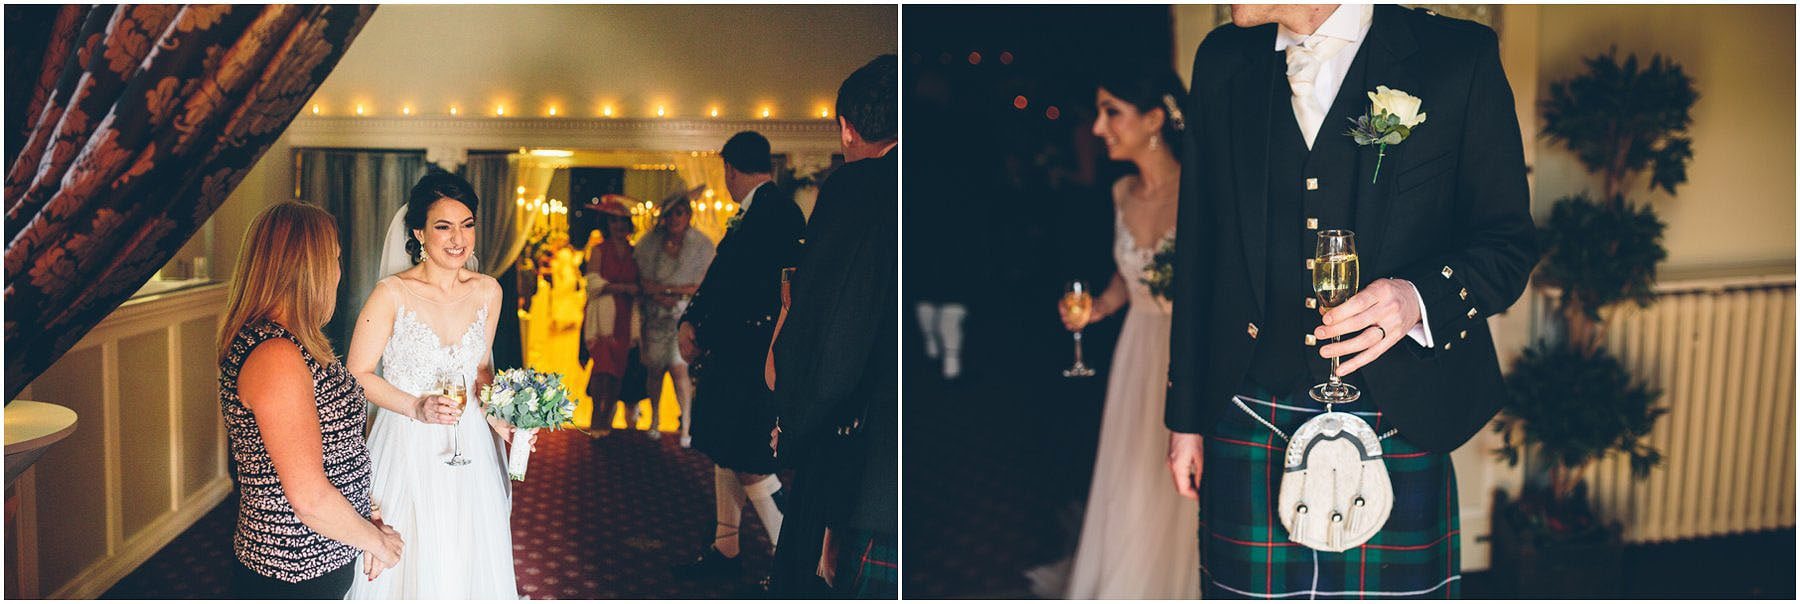 Bowdon_Rooms_Wedding_Photography_0052